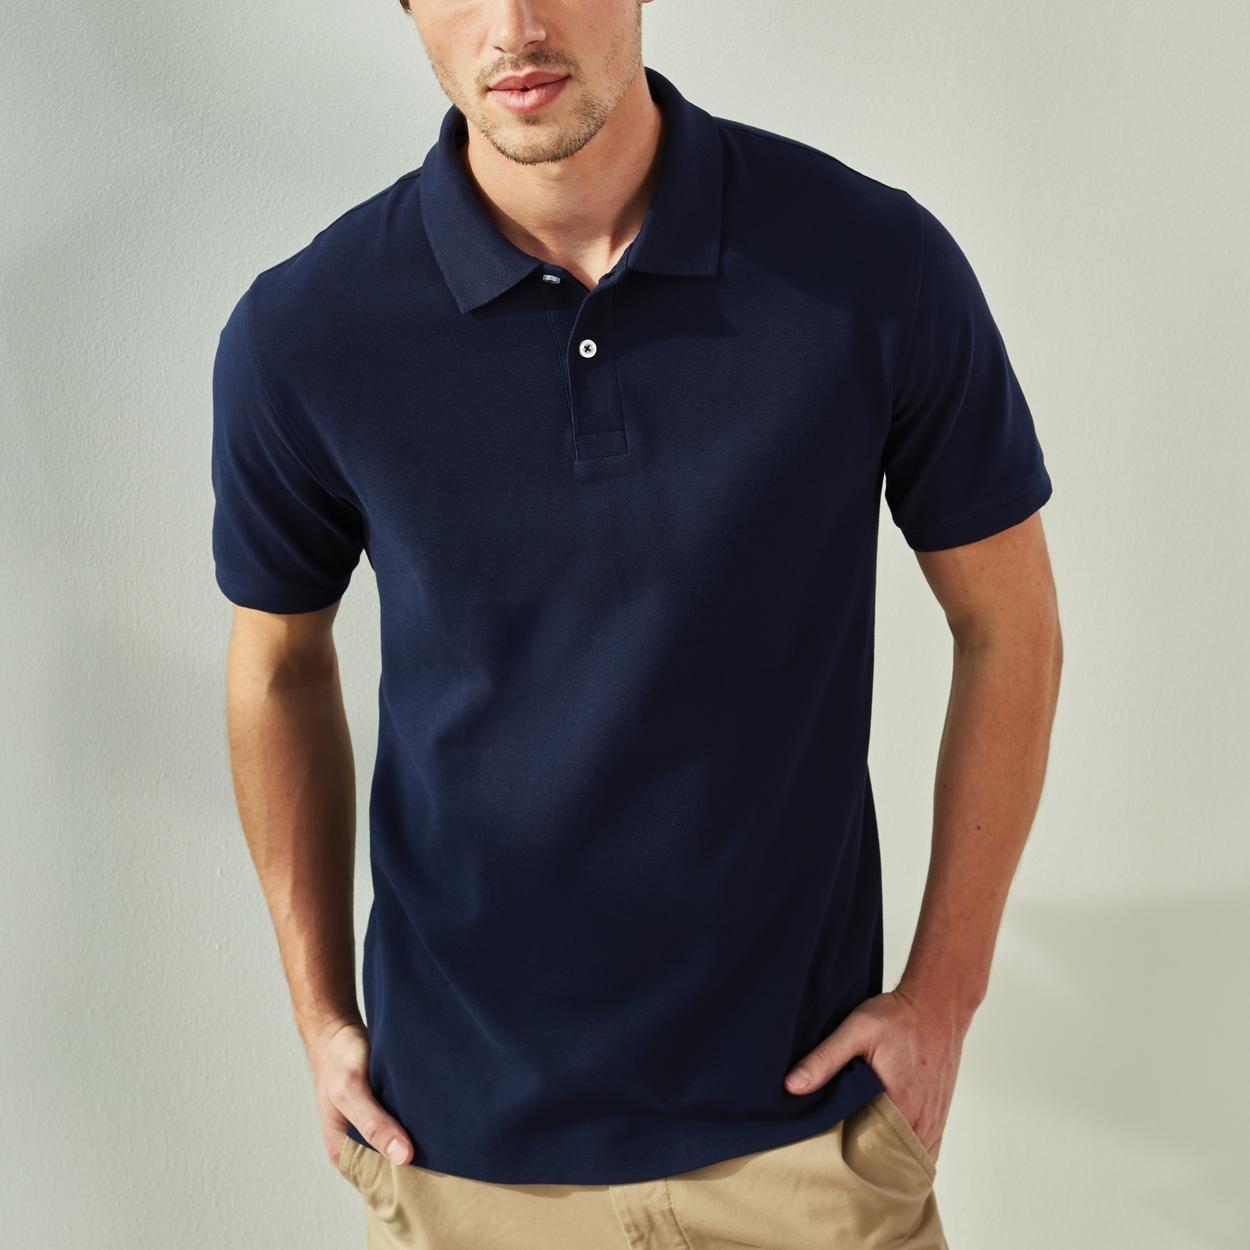 Shirts Dress Ebay Polo Lauren Ralph IW9HED2